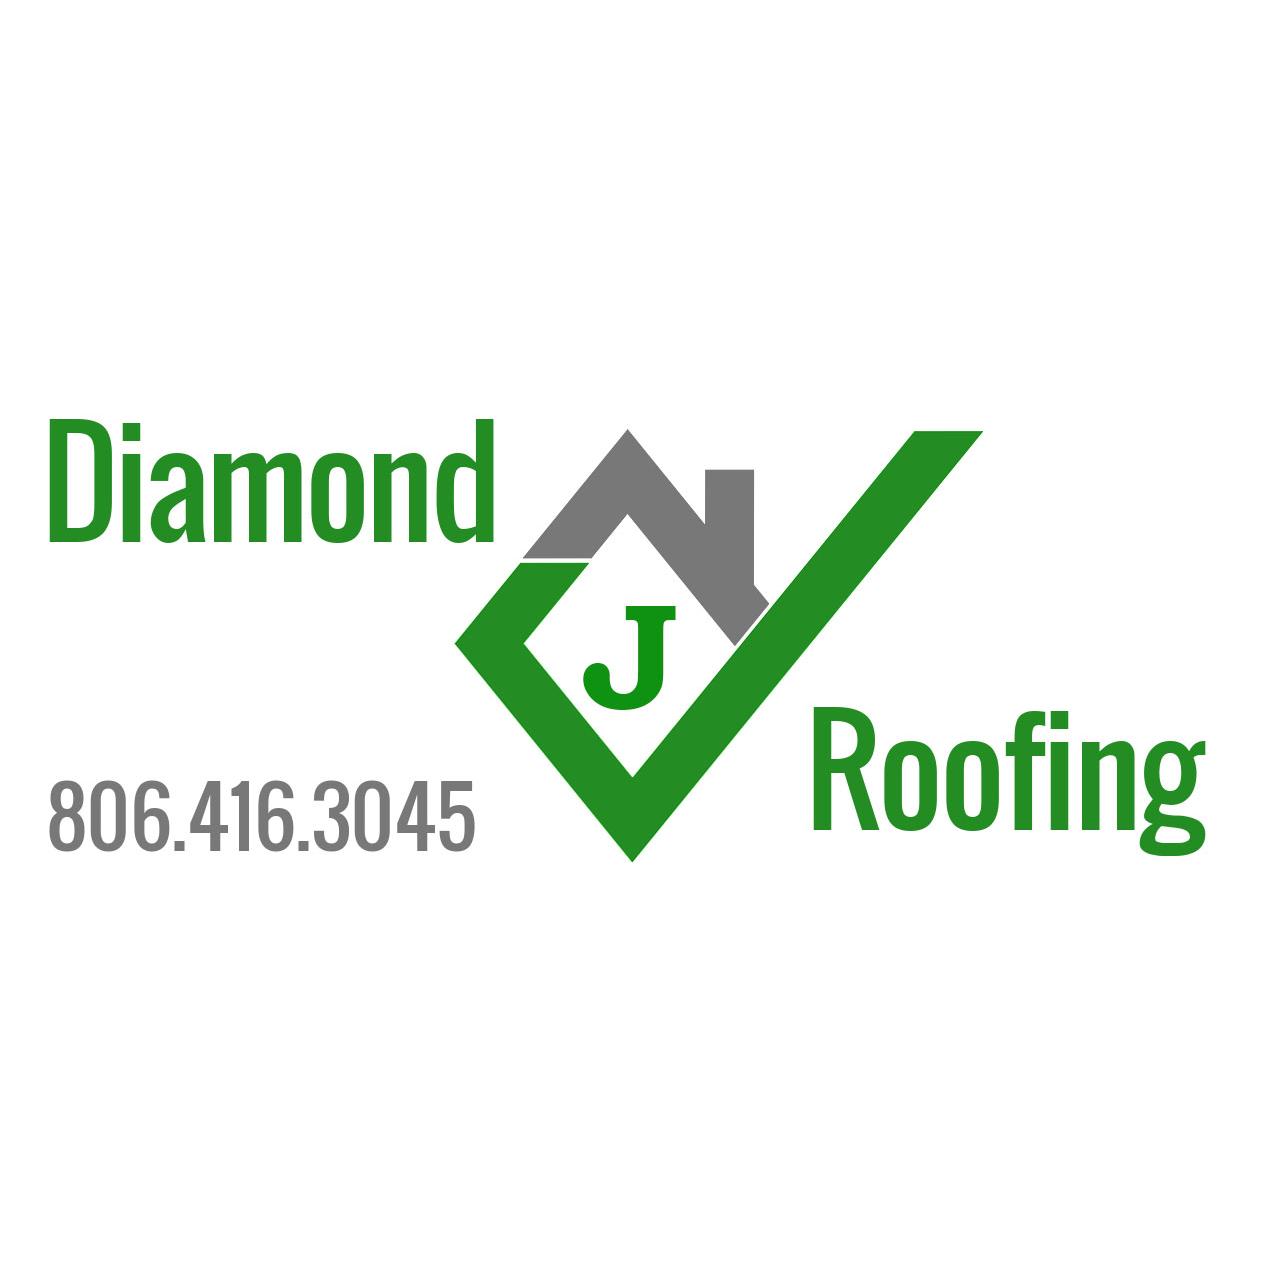 Diamond J Roofing Llc In Lubbock Tx 79412